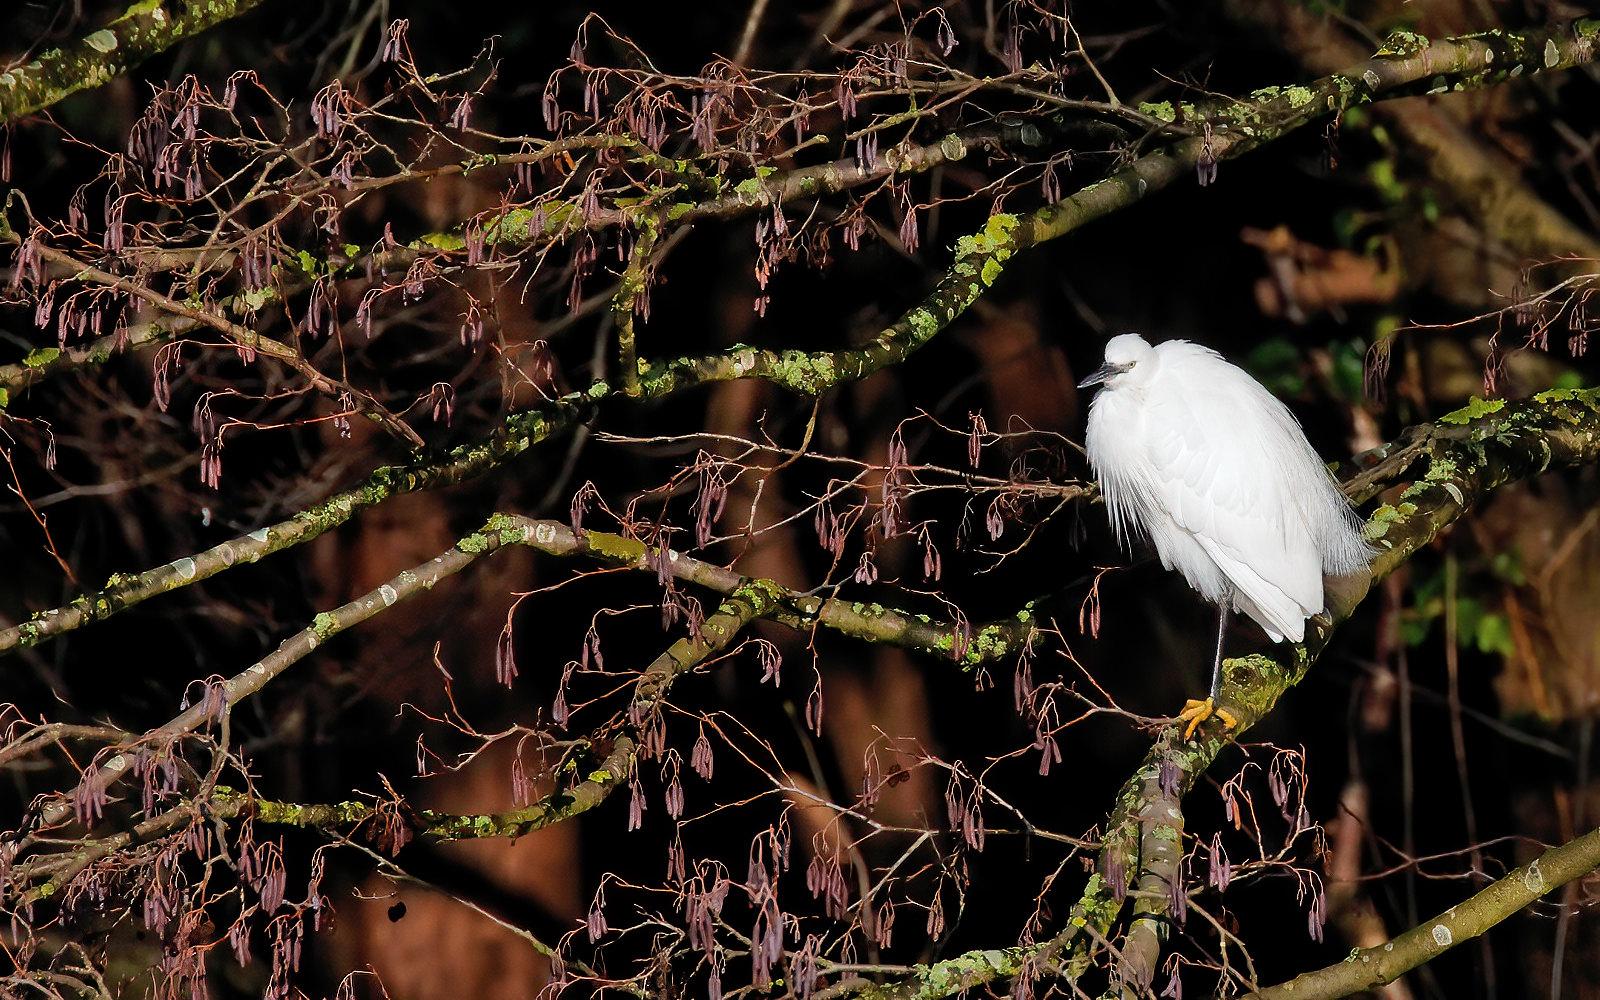 Little Egret - adult